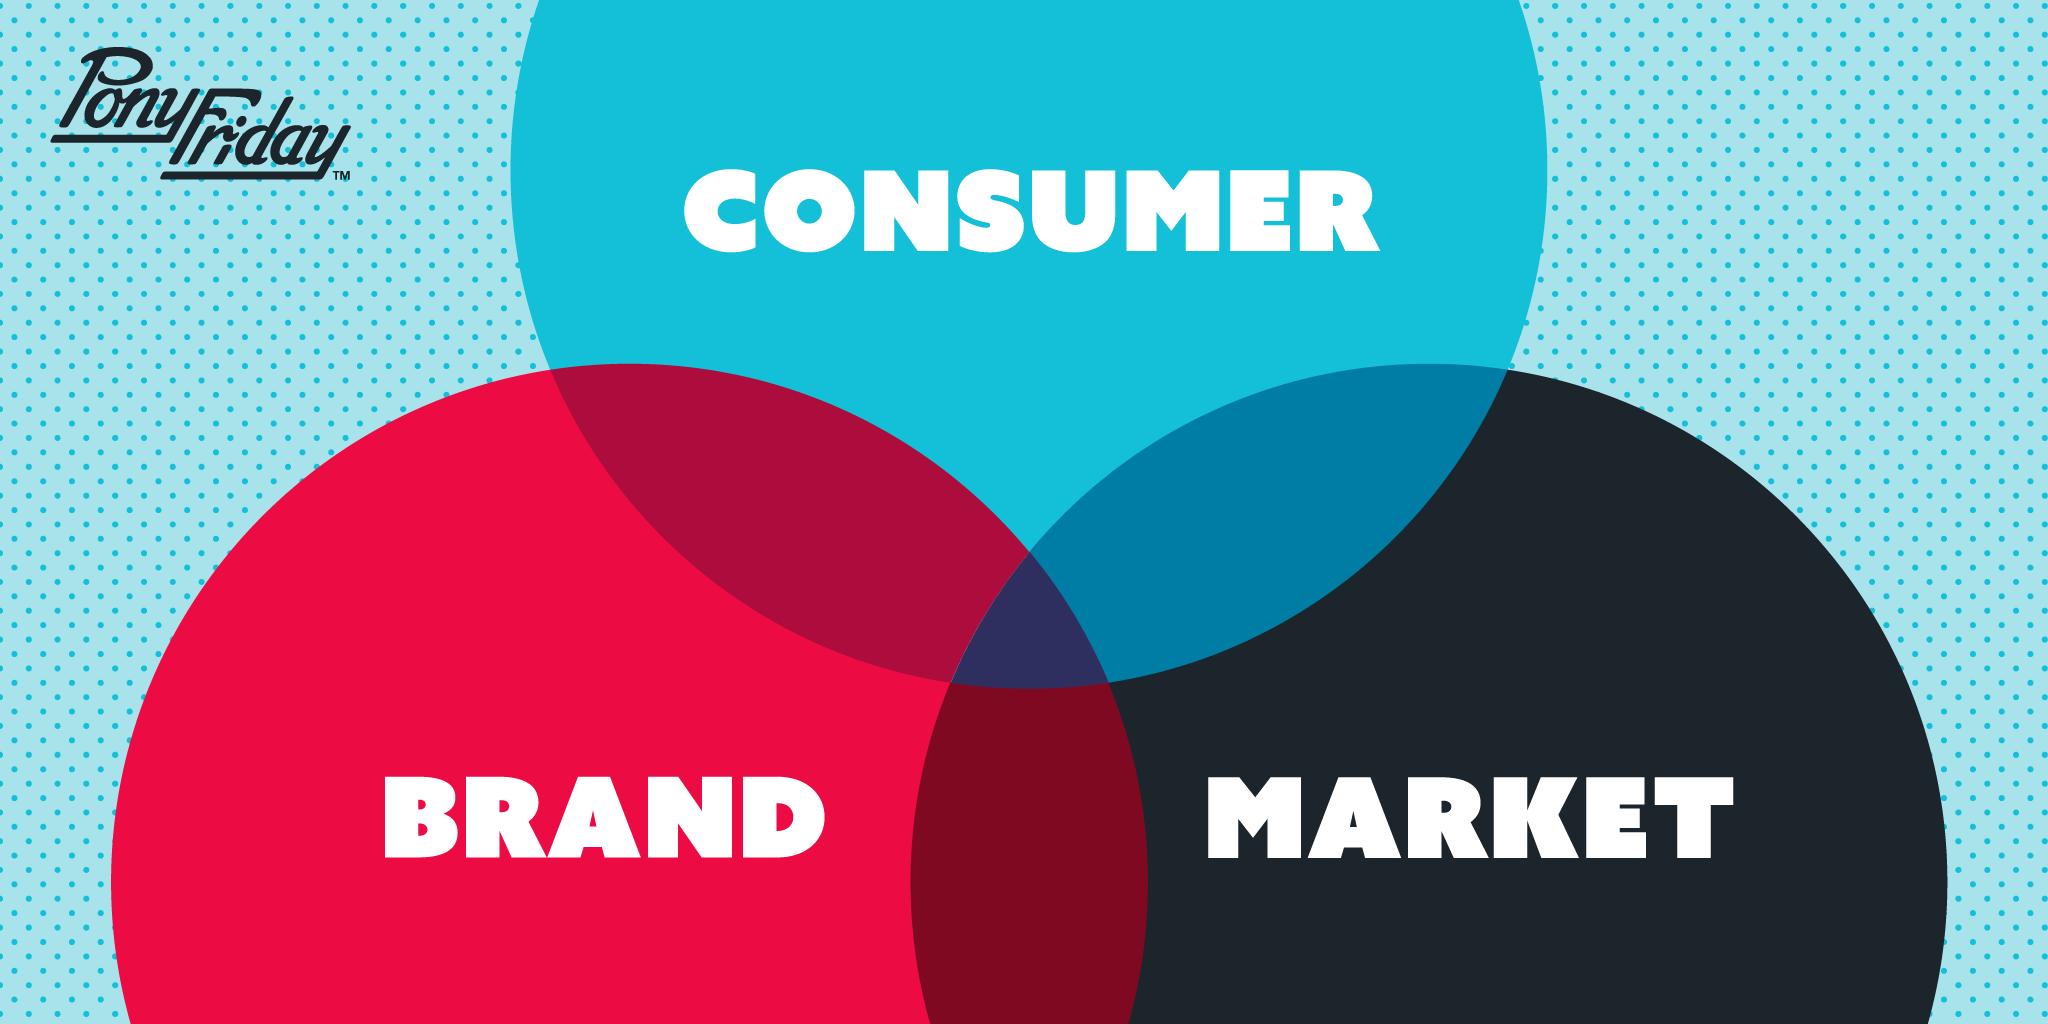 Pony-Friday-Consumer-Brand-Market-Trifecta-Creative-Director-Venn-Diagram-Blog-Header.png